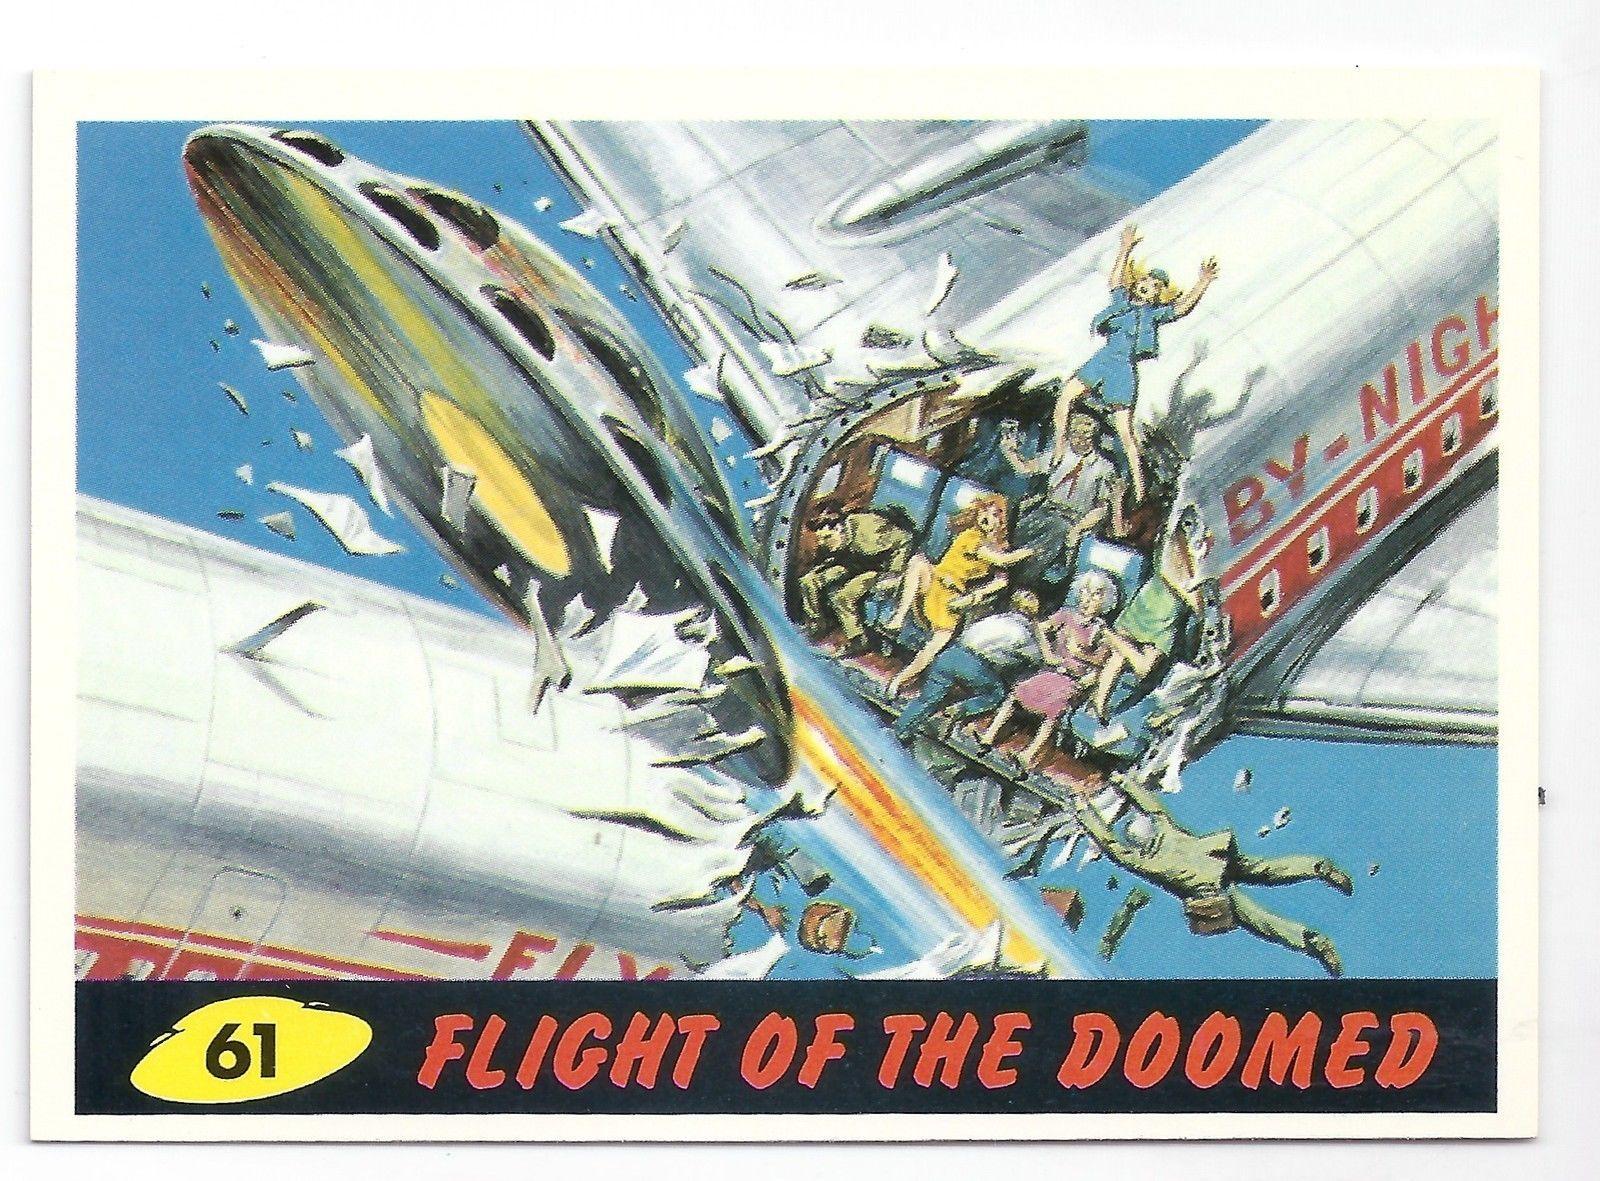 1994 topps mars attacks base card 61 flight of the